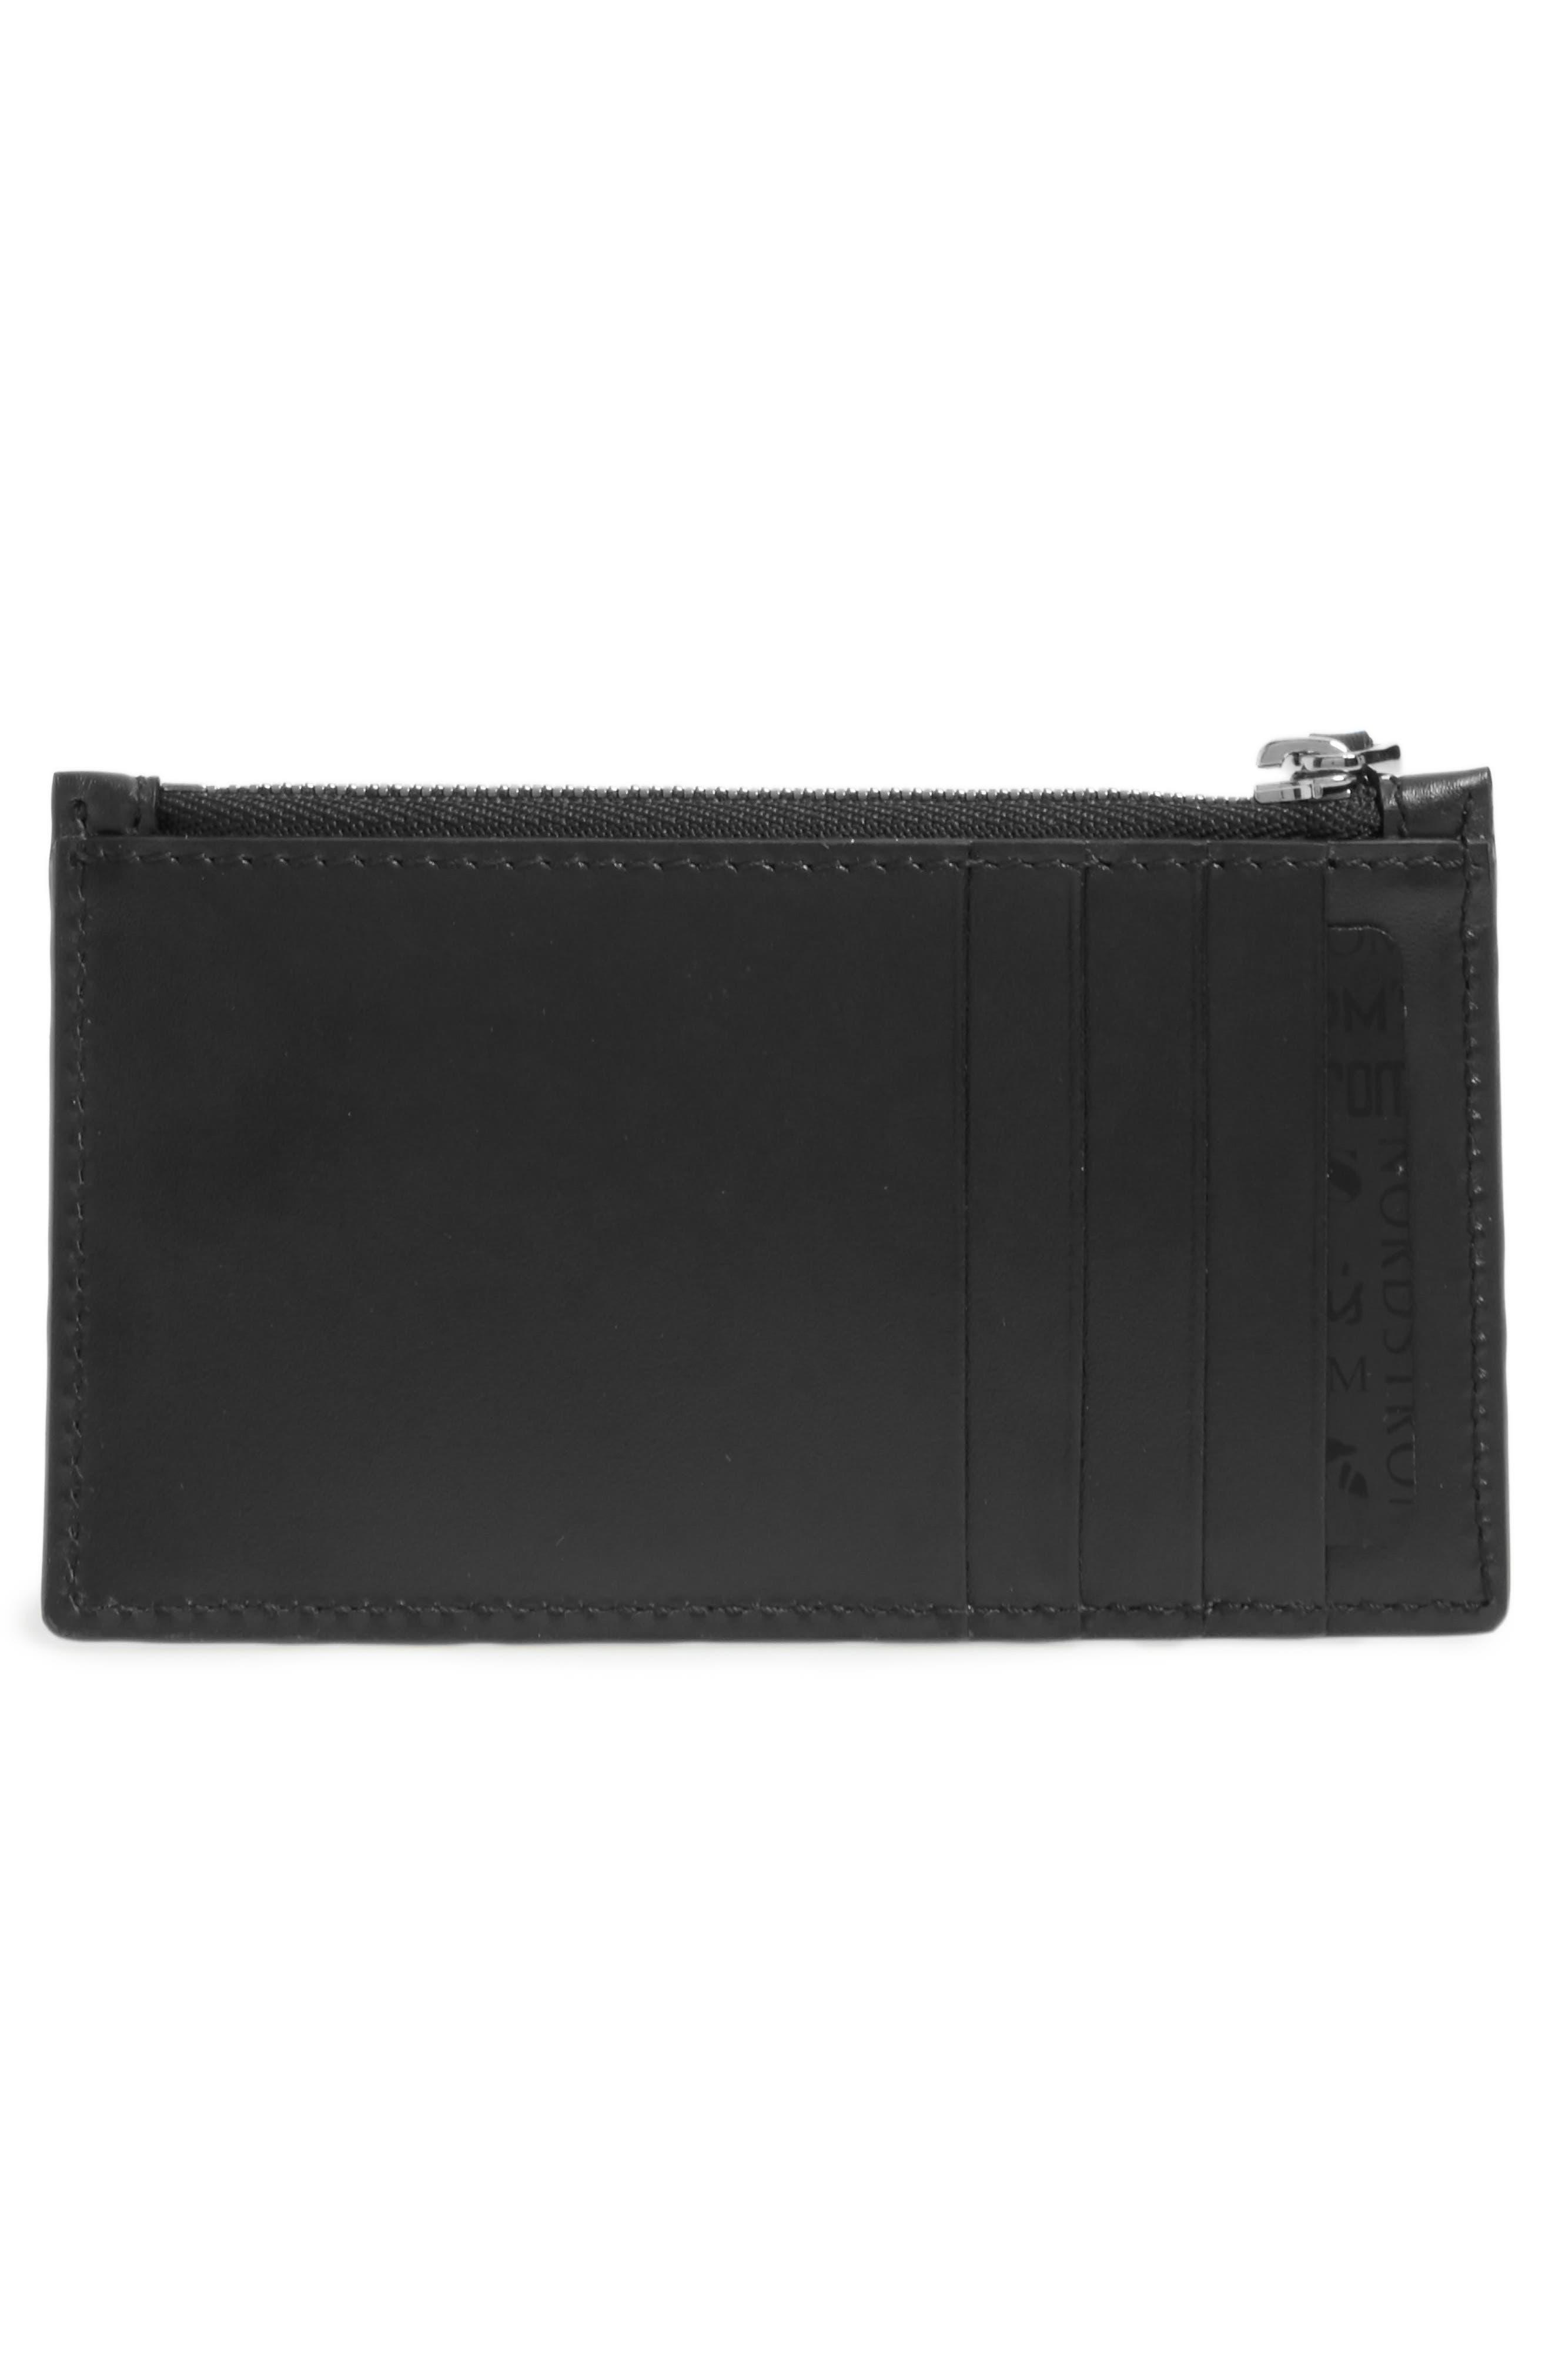 Avel Embossed Leather Card Case,                             Alternate thumbnail 2, color,                             Black